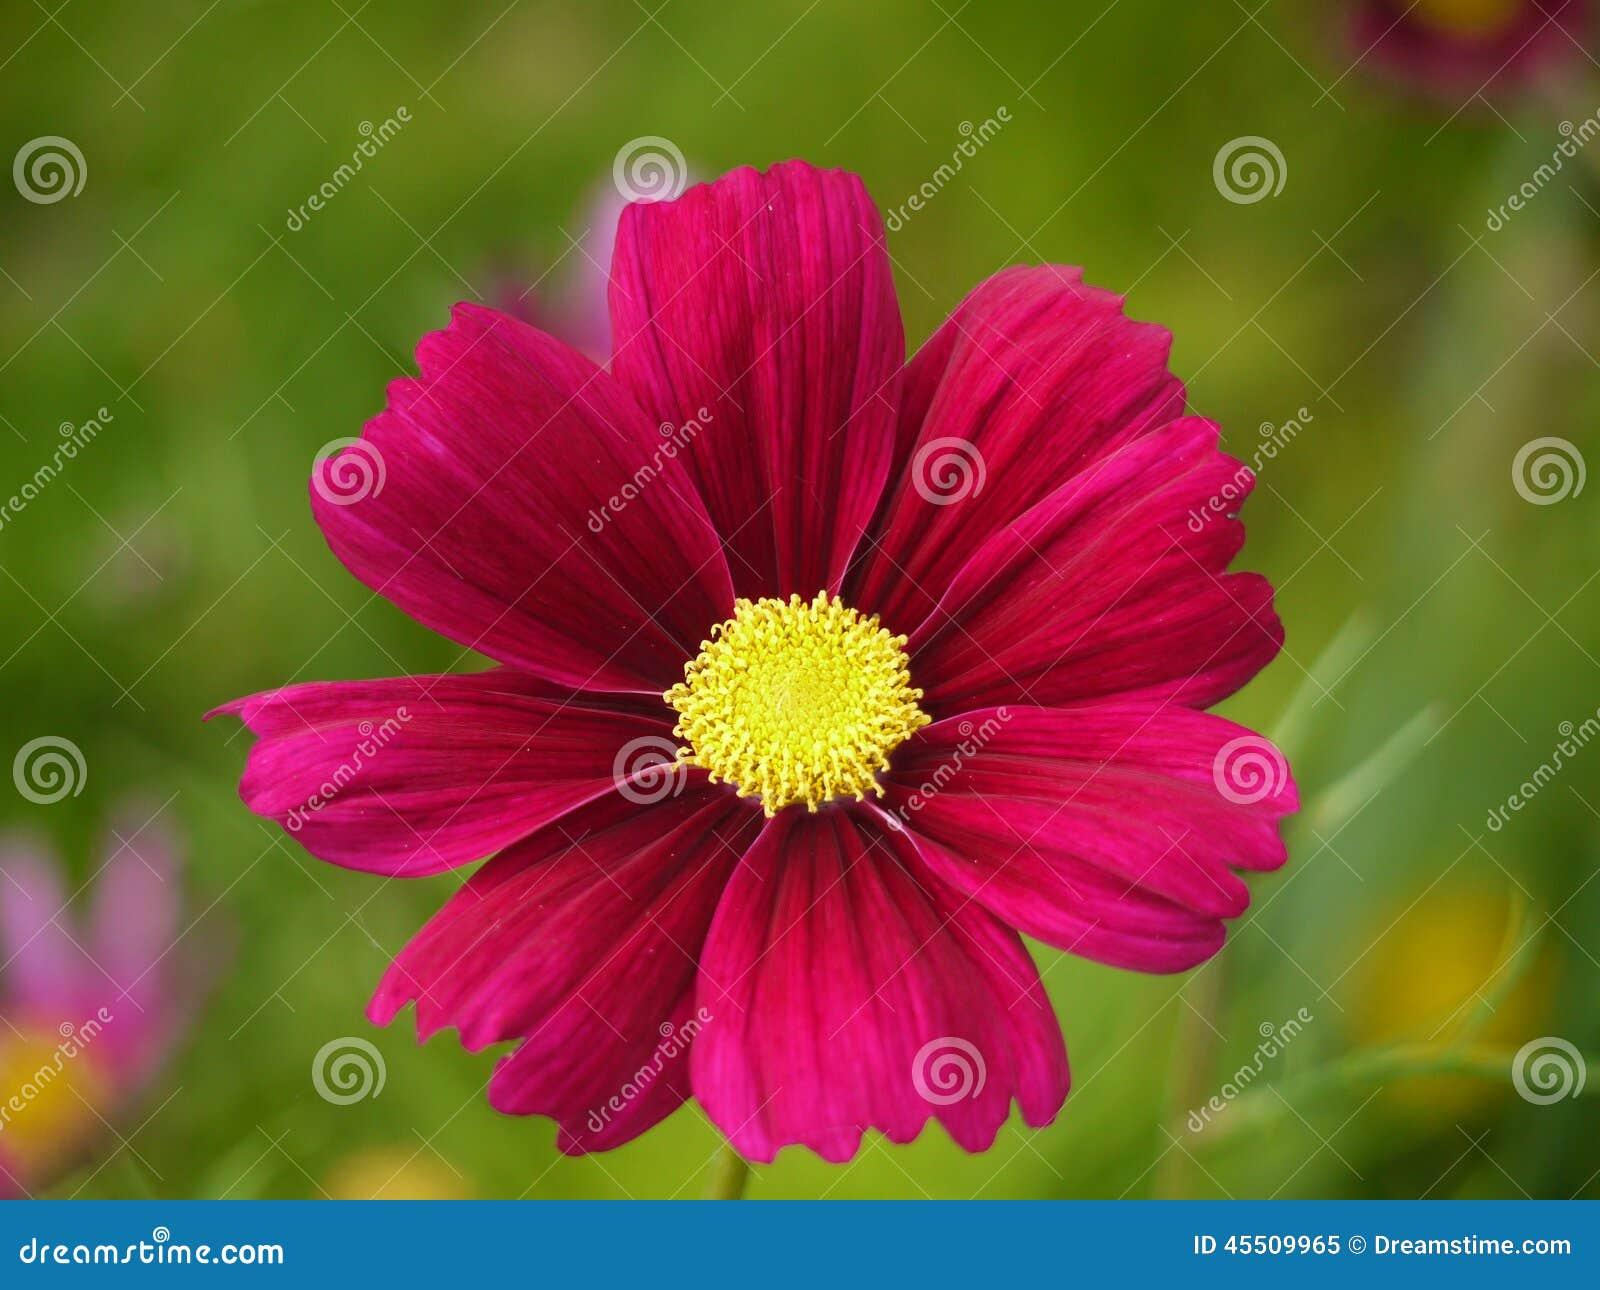 Dark pink cosmos flower stock image image of garden 45509965 dark pink cosmos flower mightylinksfo